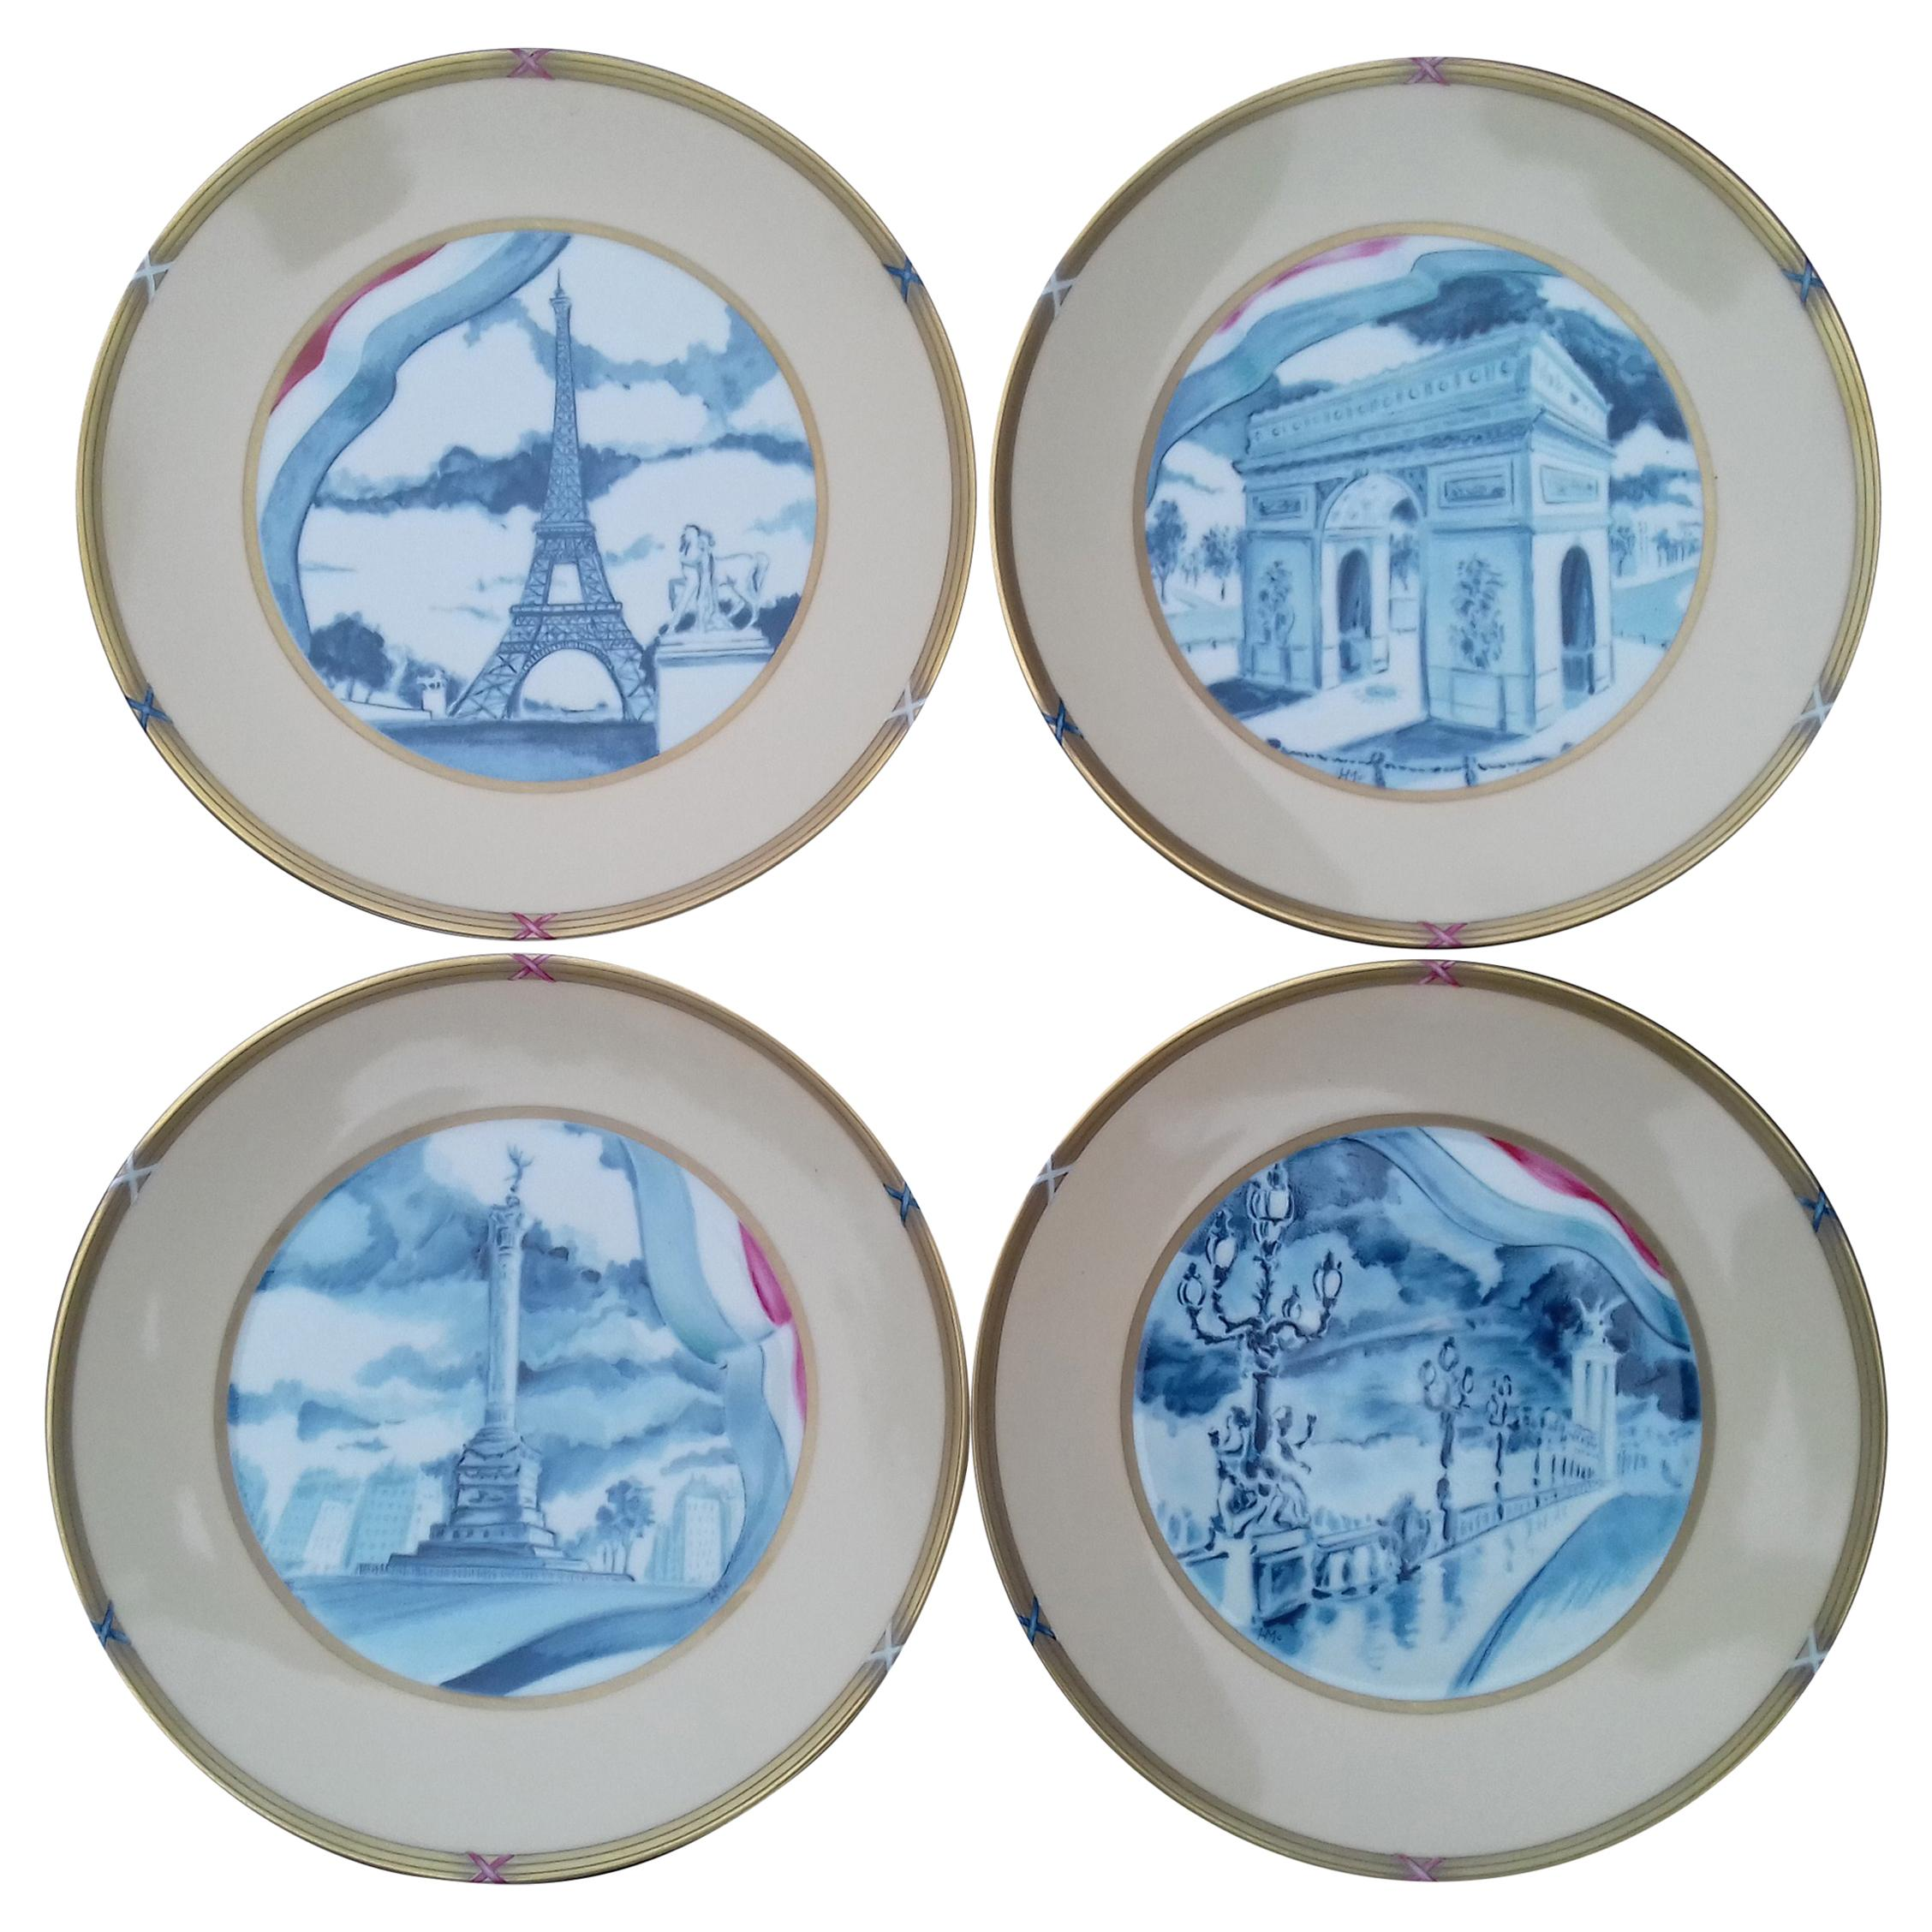 Hermès Exceptional Set of 4 Plates Souvenir De Paris French Revolution RARE